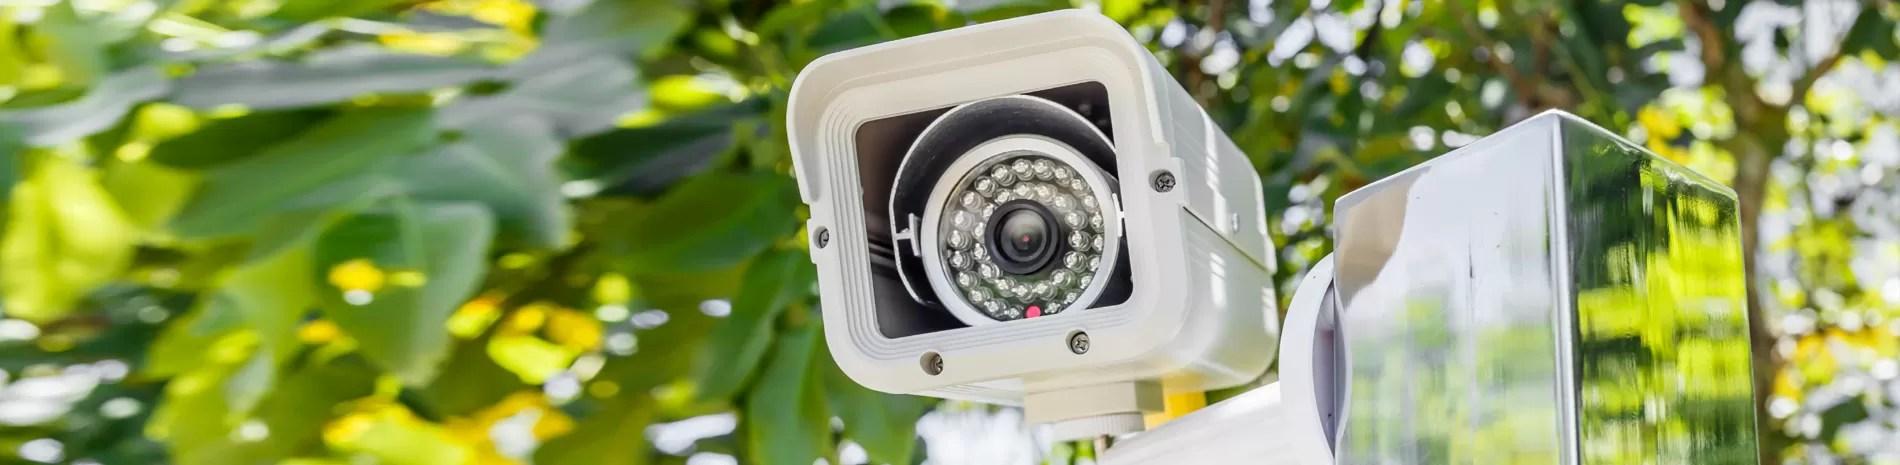 BBG security camera Innisfil